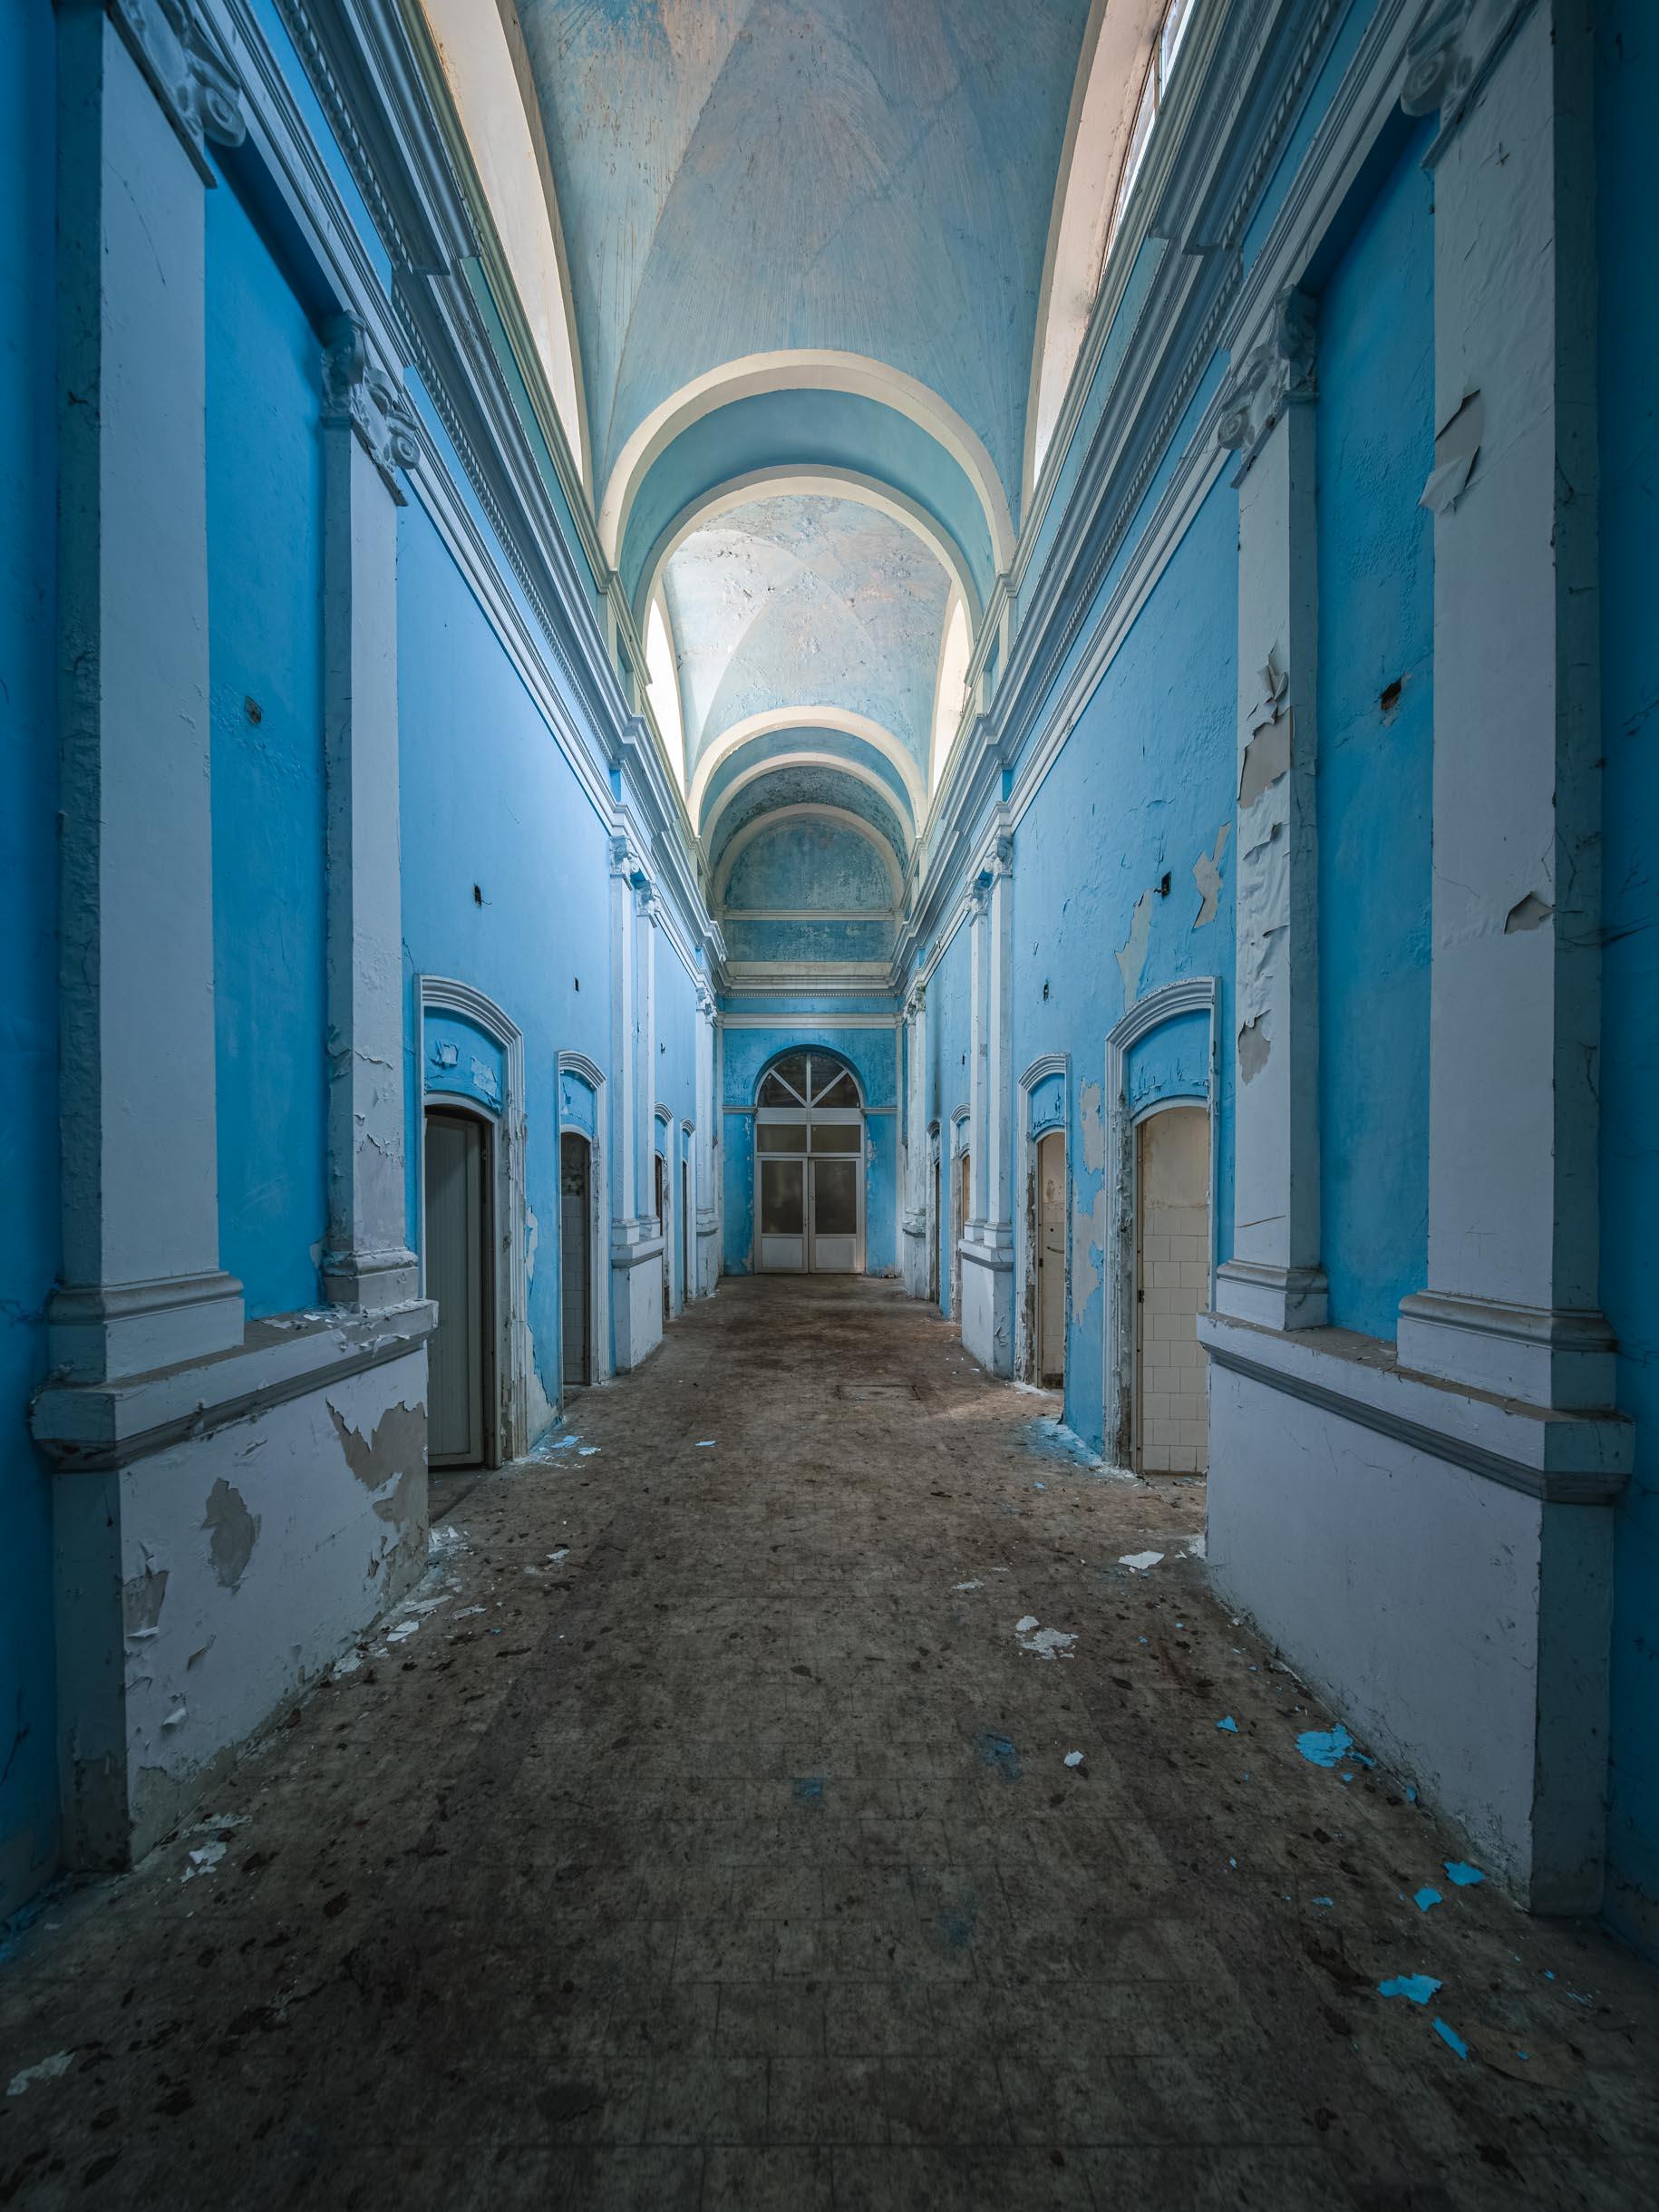 The blue corridor.